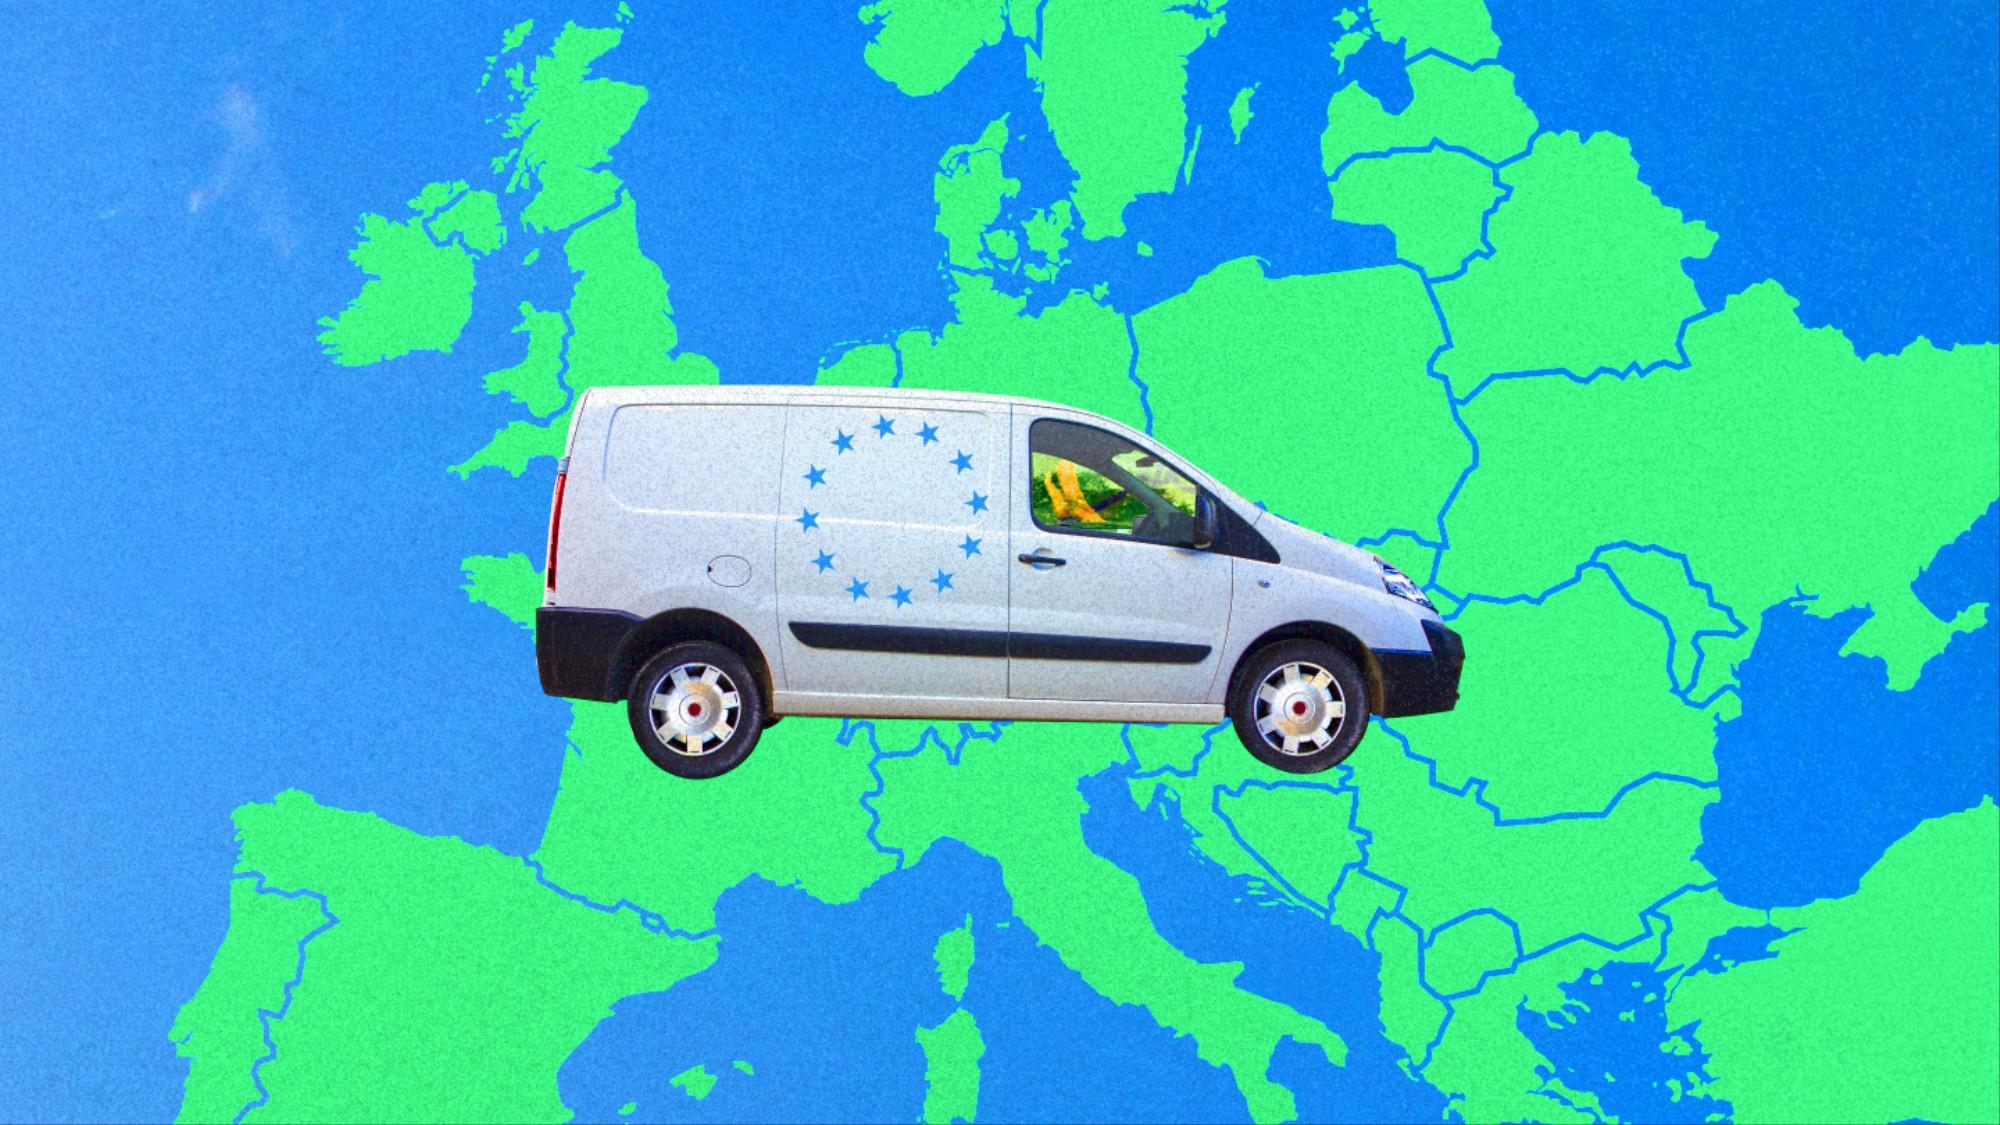 Van Life: What Is It Like to Live in a Van? - VICE